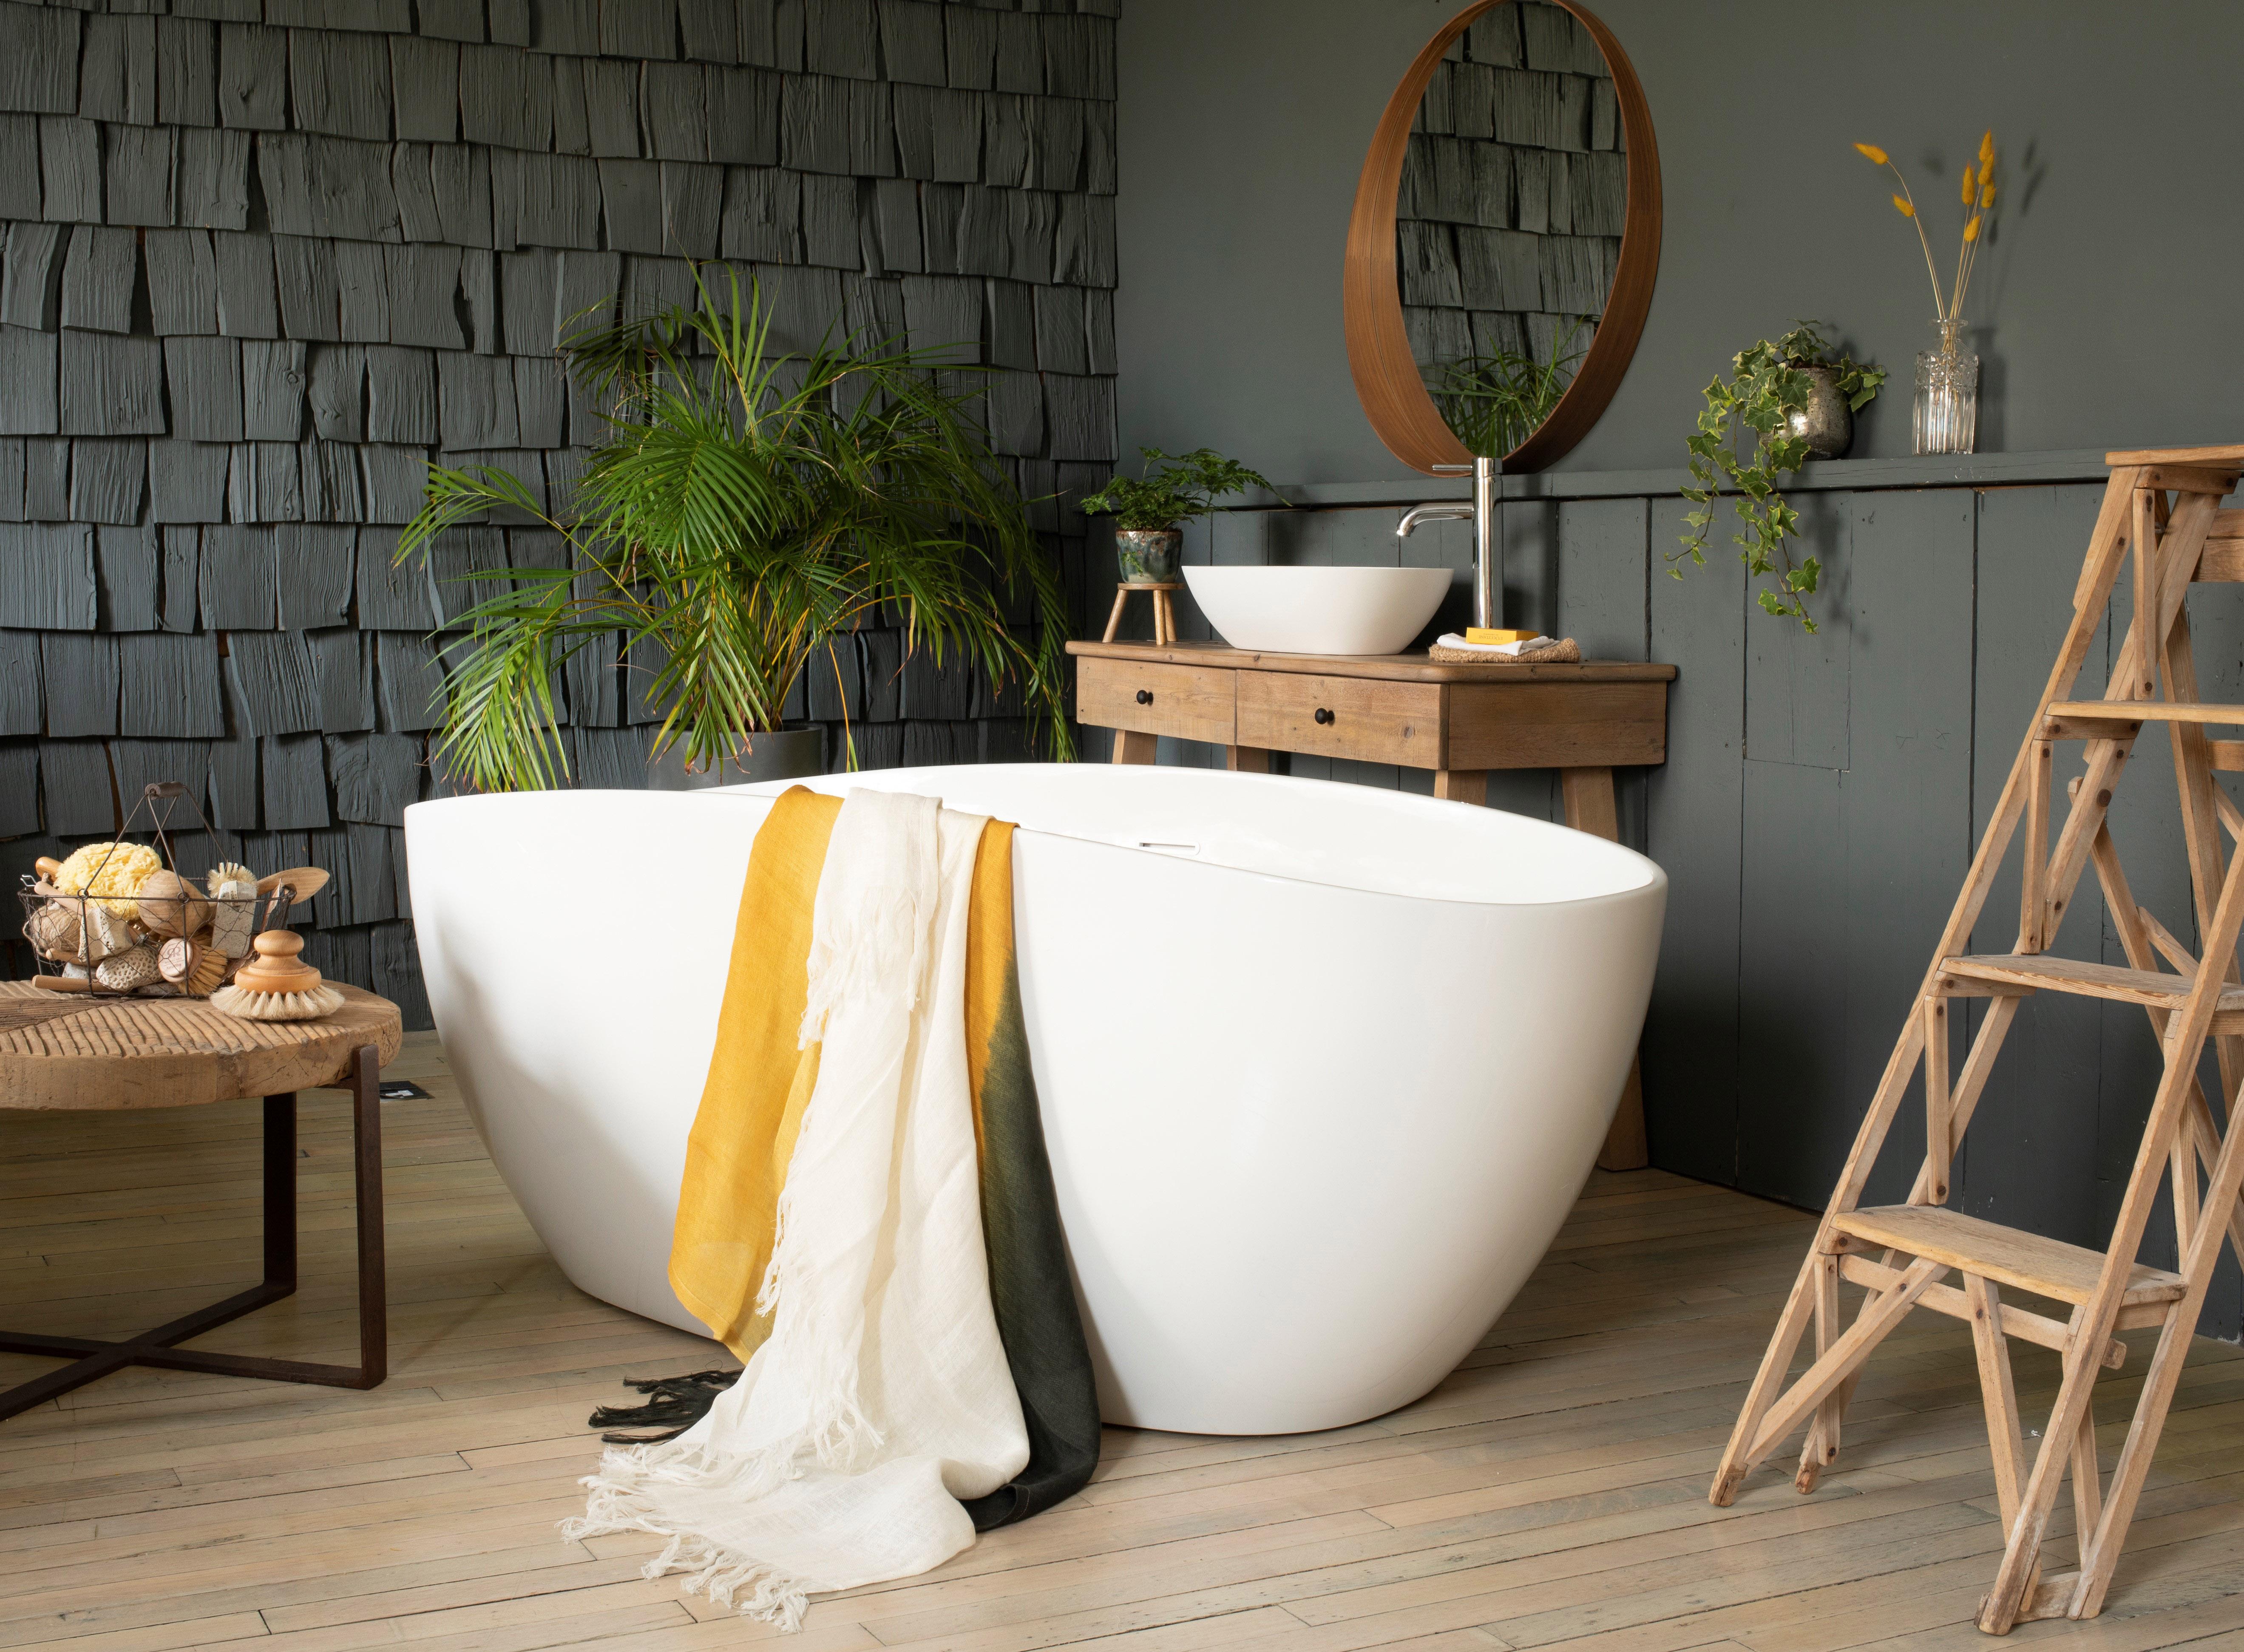 Luxury Bathroom Ideas 30 Ways To Get A, High End Bathroom Suites